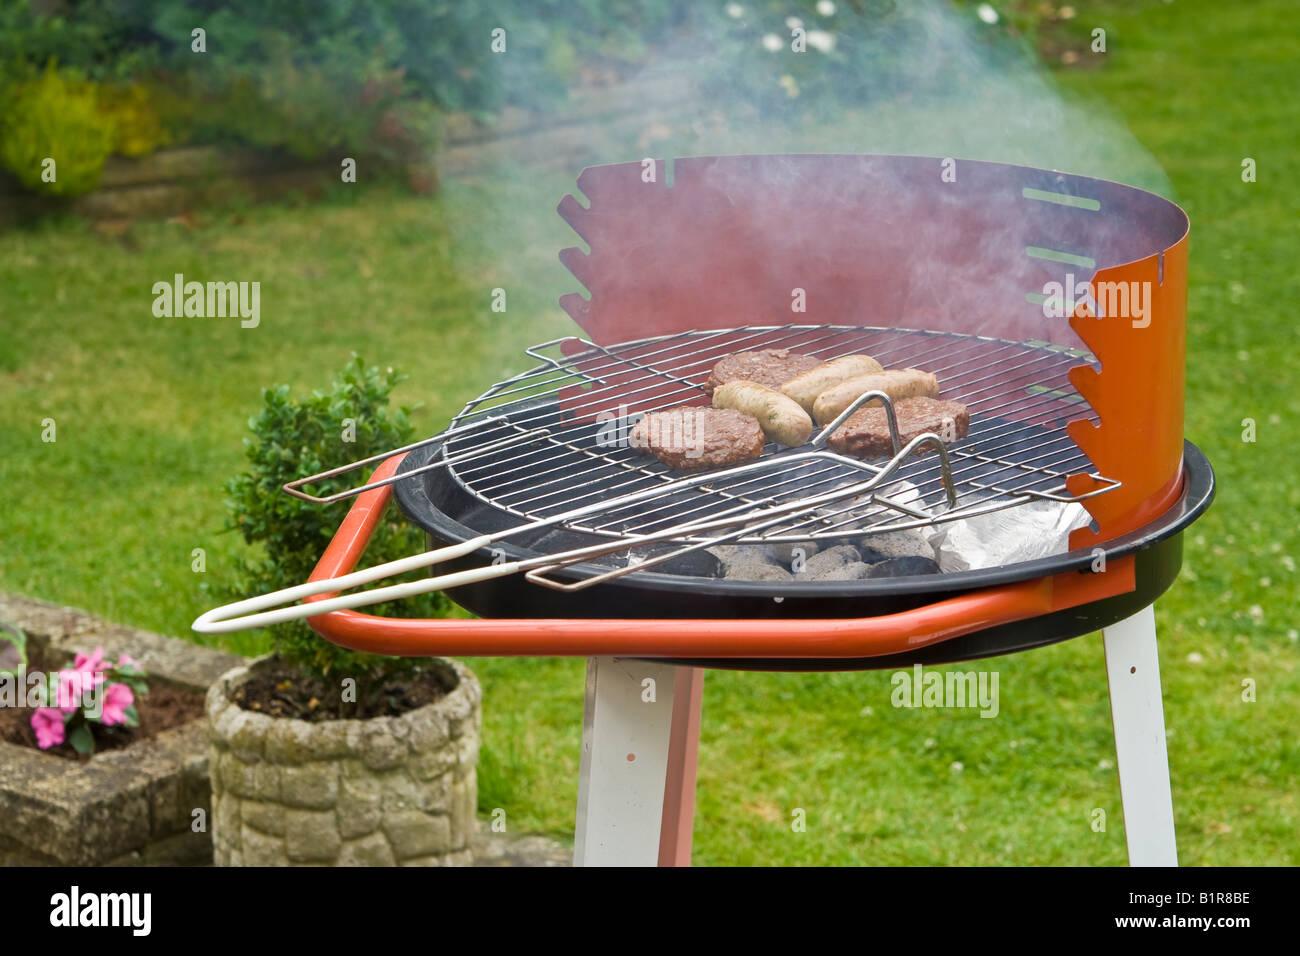 Barbecue Food Uk Stockfotos & Barbecue Food Uk Bilder - Alamy